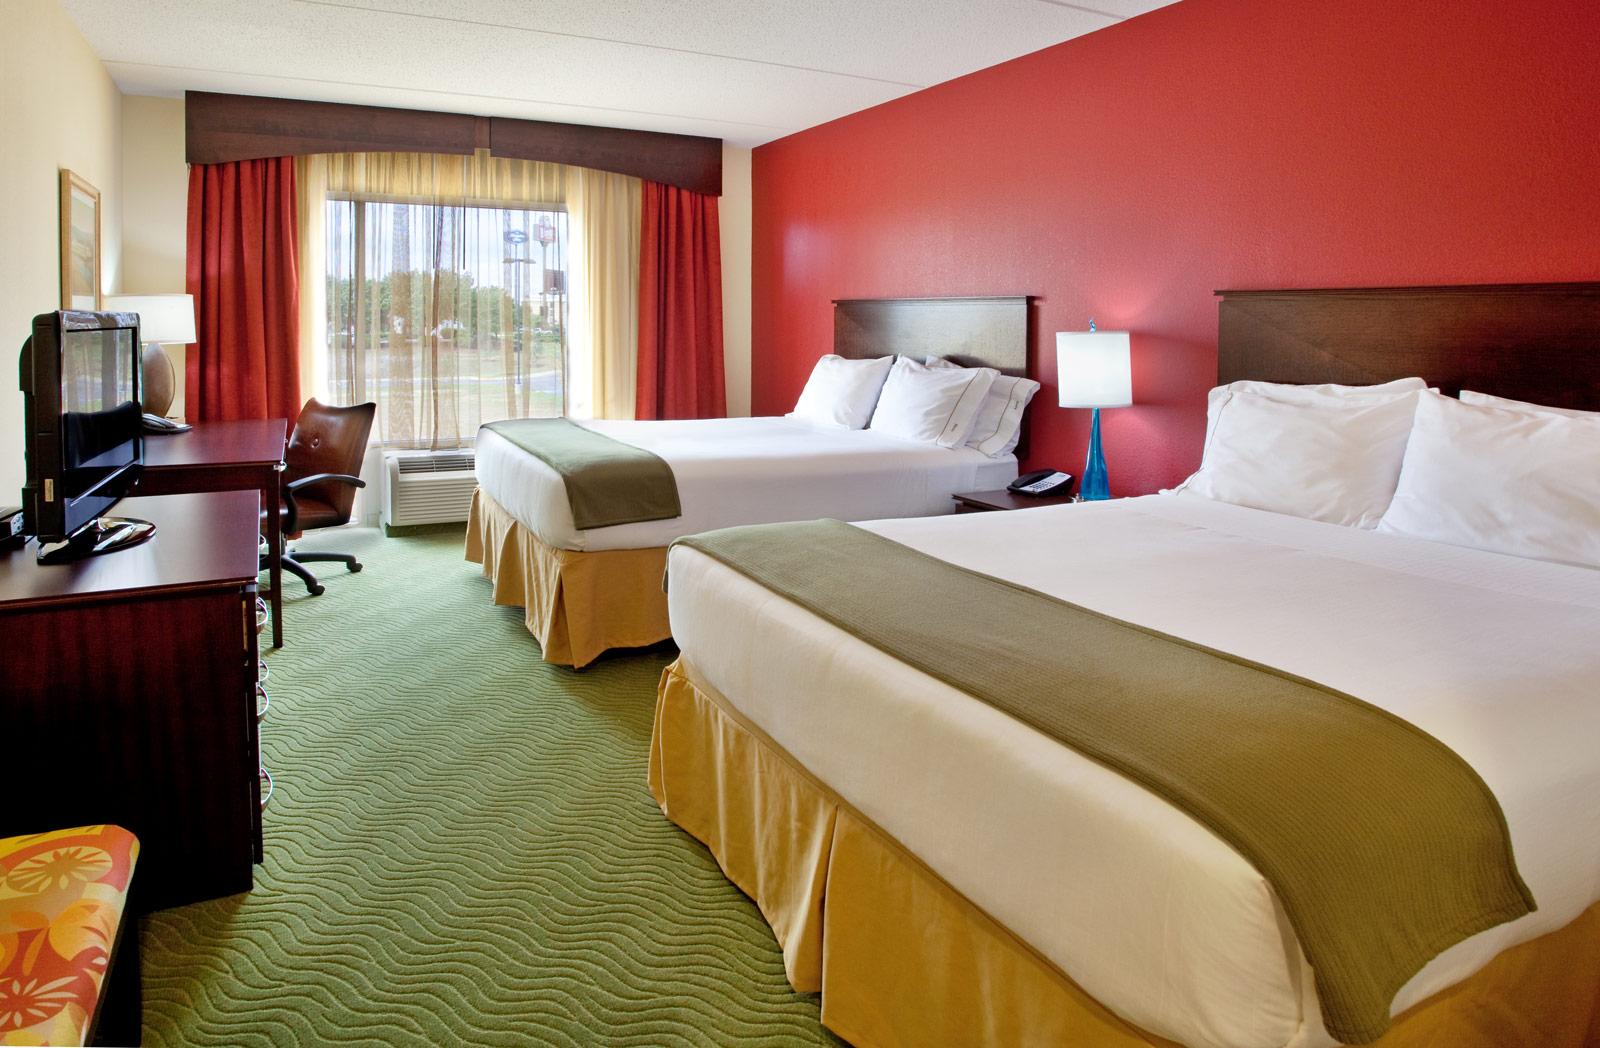 spartanburg-hotel-double